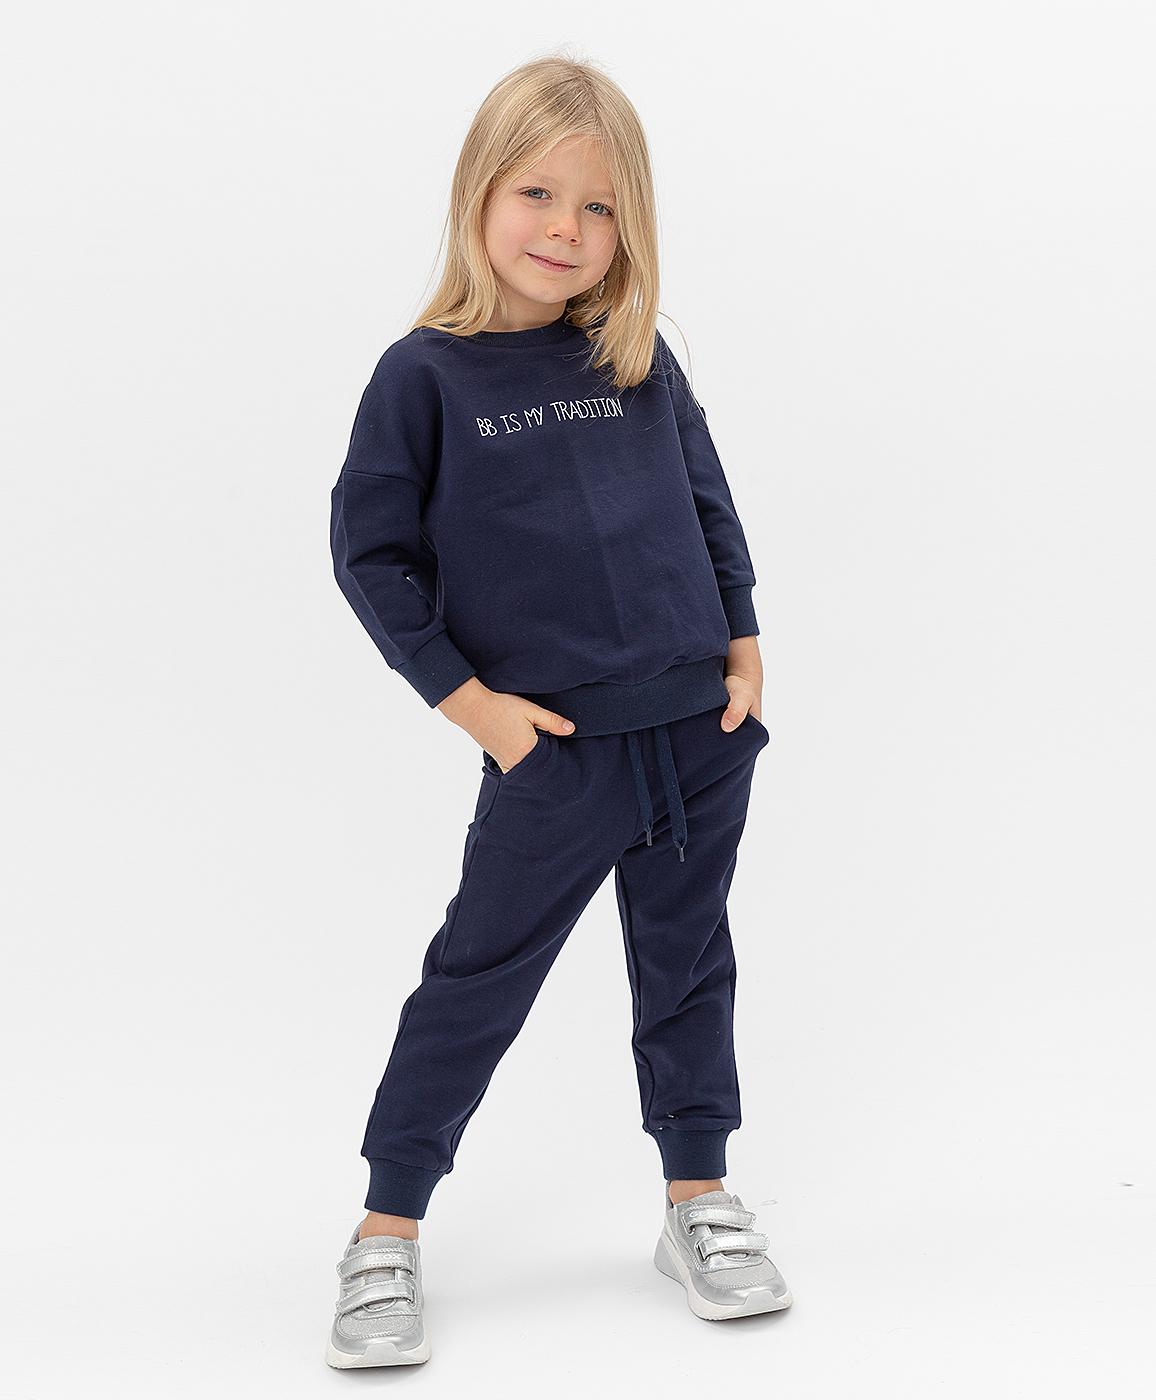 Купить 121BBGB56011000, Синие брюки Button Blue, синий, 122, Футер, Женский, Весна, ВЕСНА/ЛЕТО 2021 (shop: GulliverMarket Gulliver Market)